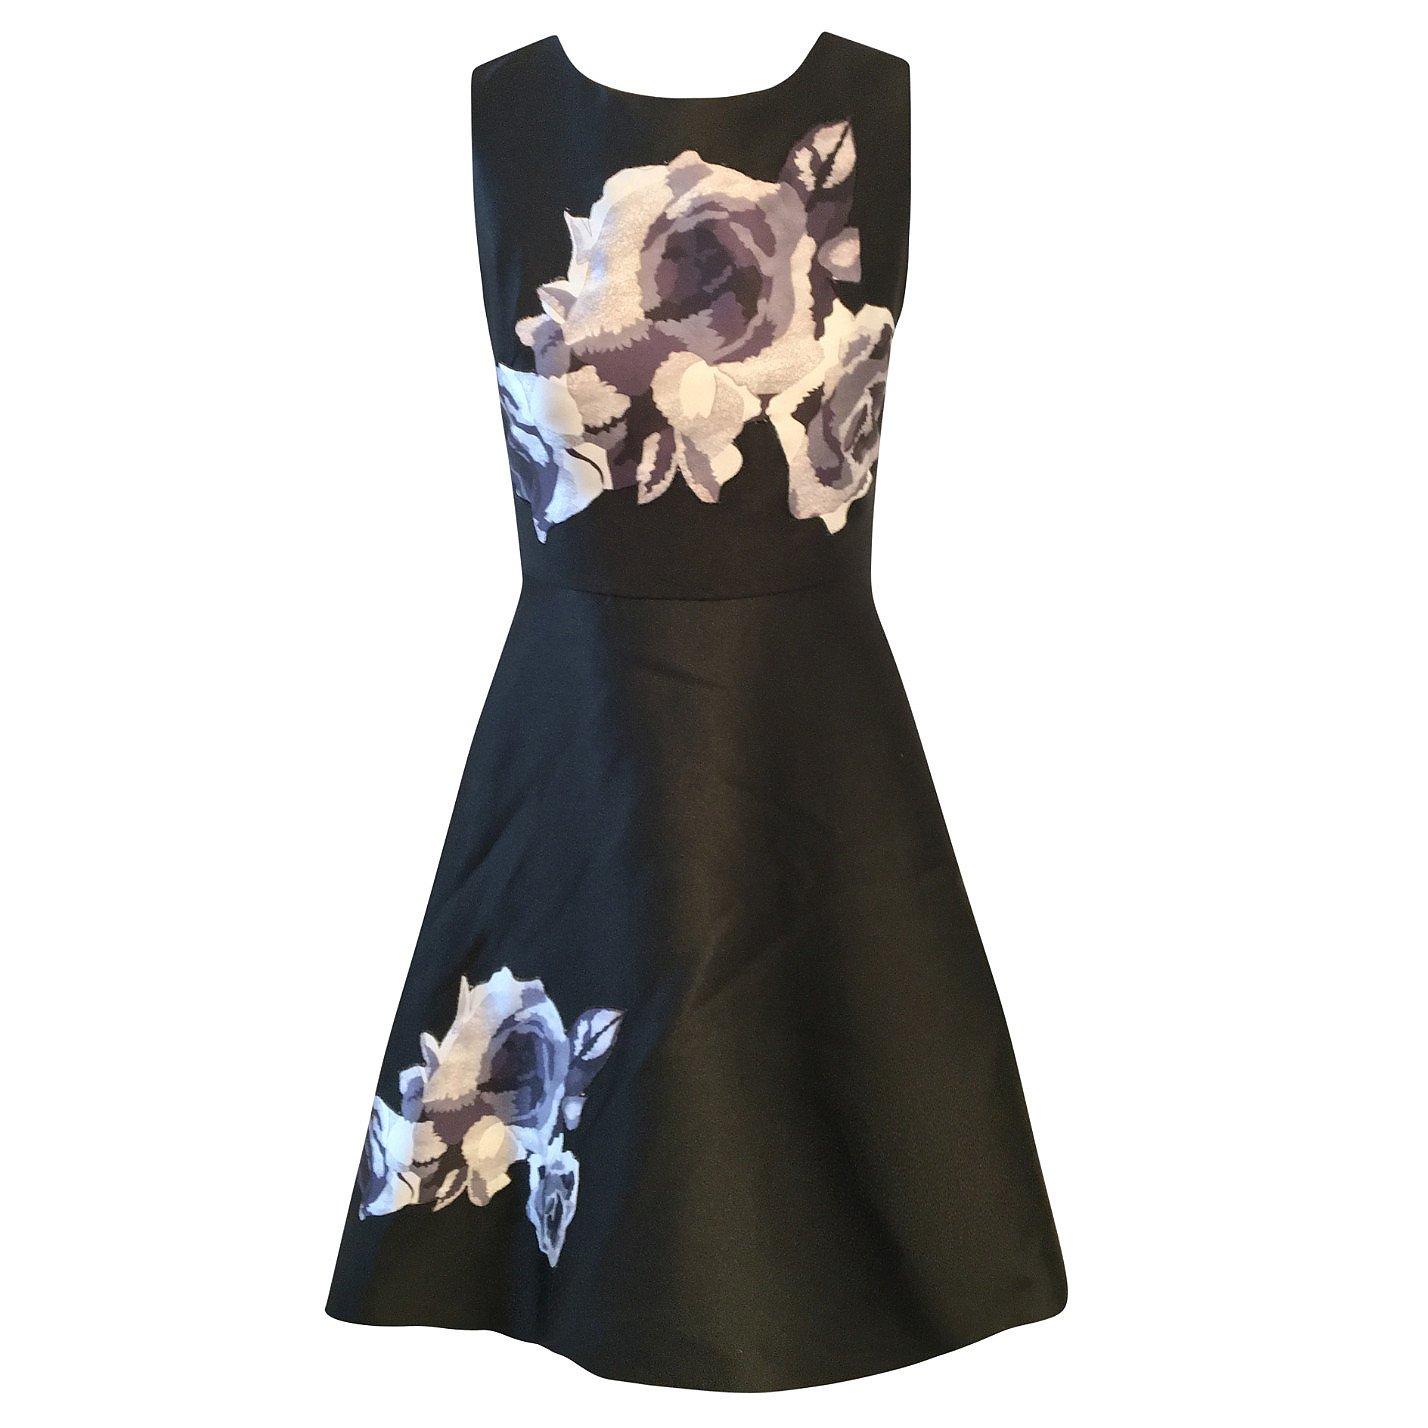 Dior Sleeveless Floral Satin Dress